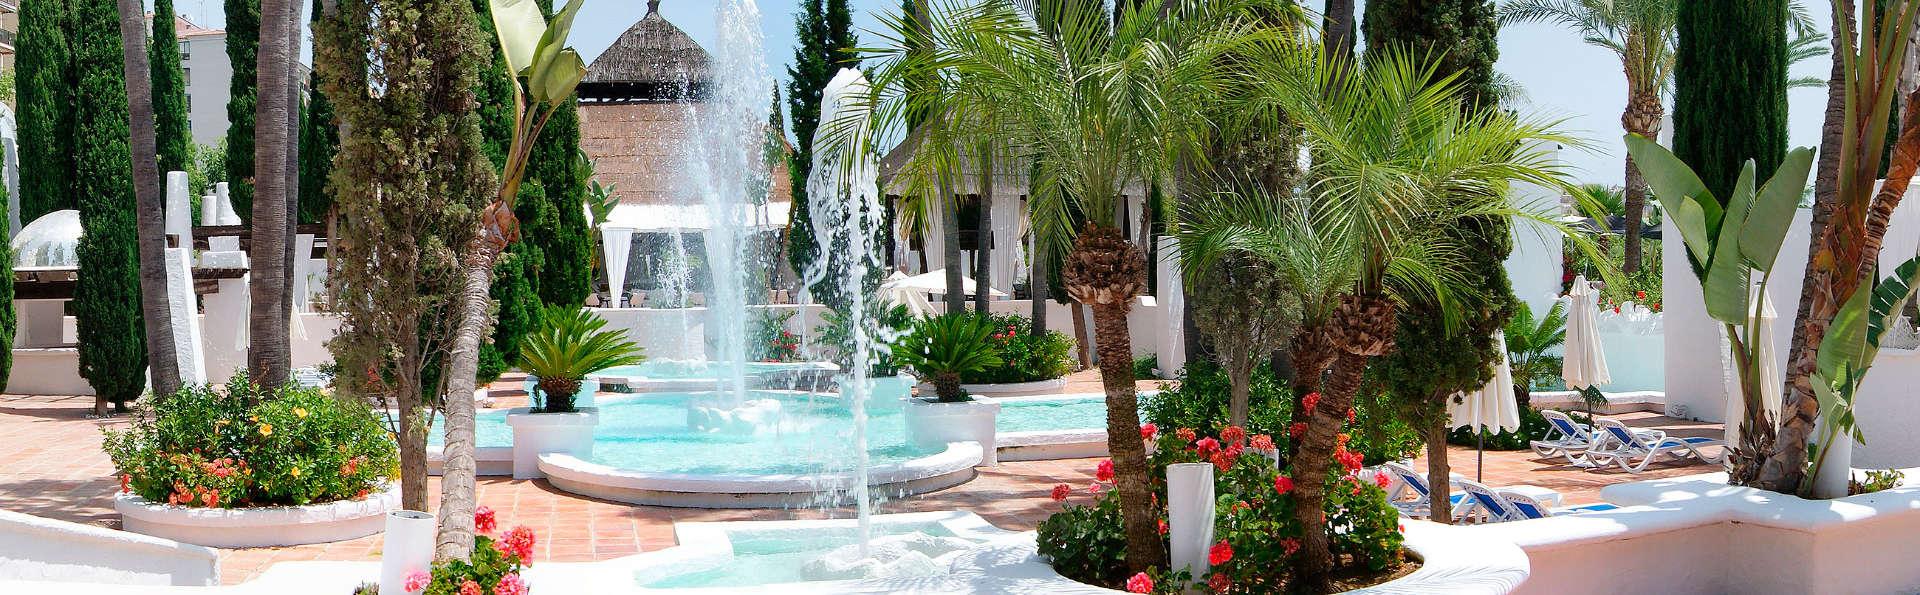 Hotel Albayzin del Mar - EDIT_garden4.jpg